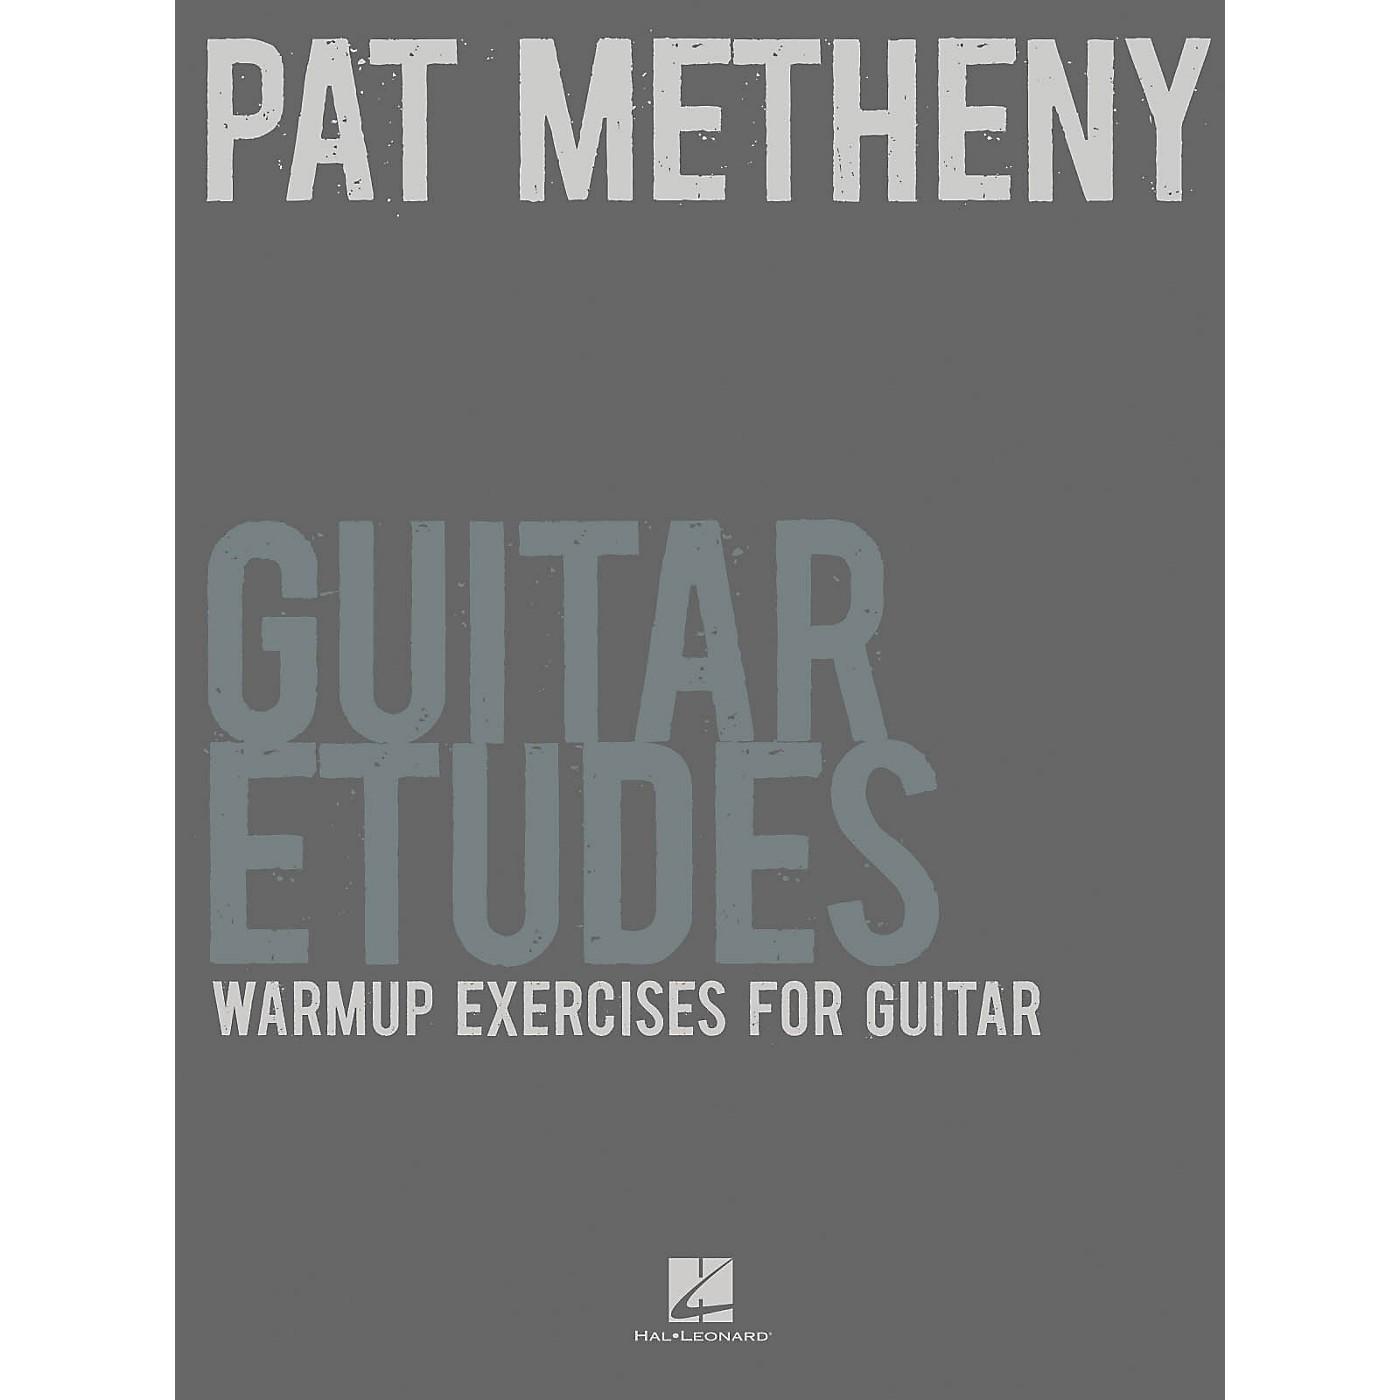 Hal Leonard Pat Metheny Guitar Etudes - Warmup Exercises For Guitar thumbnail